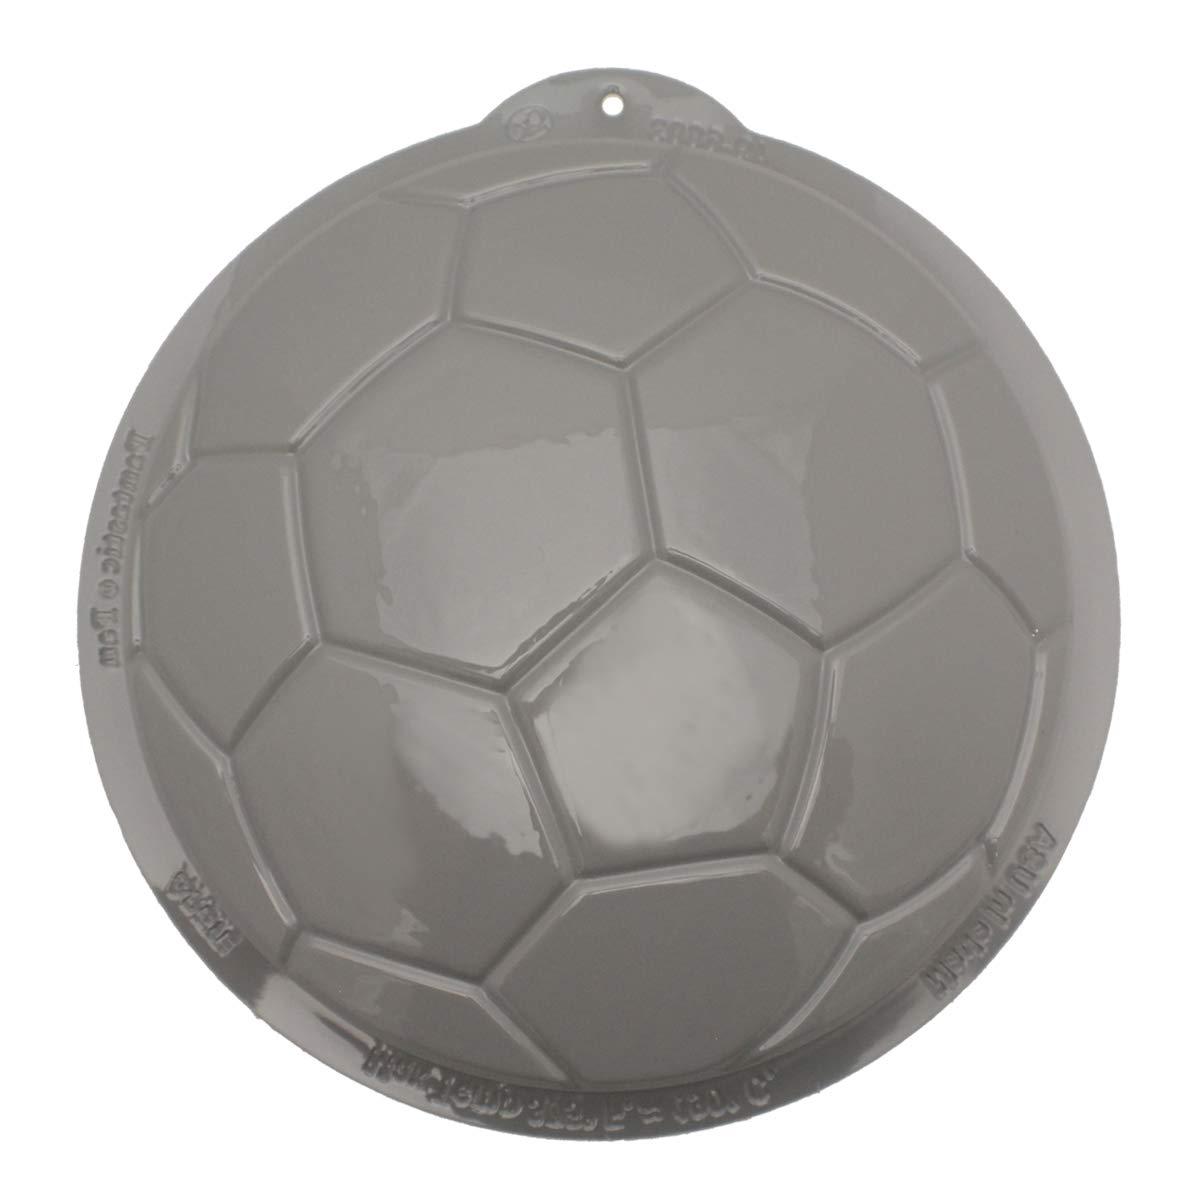 CK Products 49 - 6003 plástico balón de fútbol para tartas, color ...